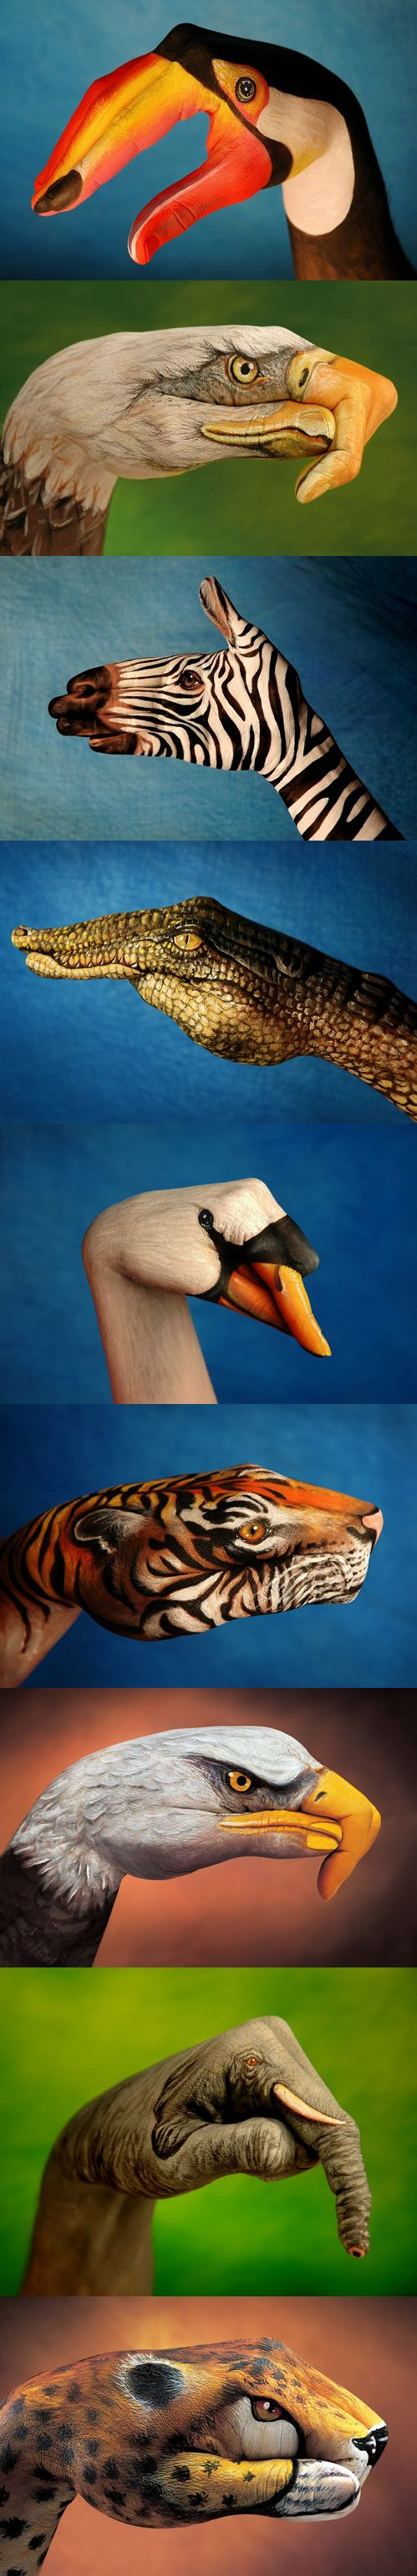 Guido Daniele Hand Art